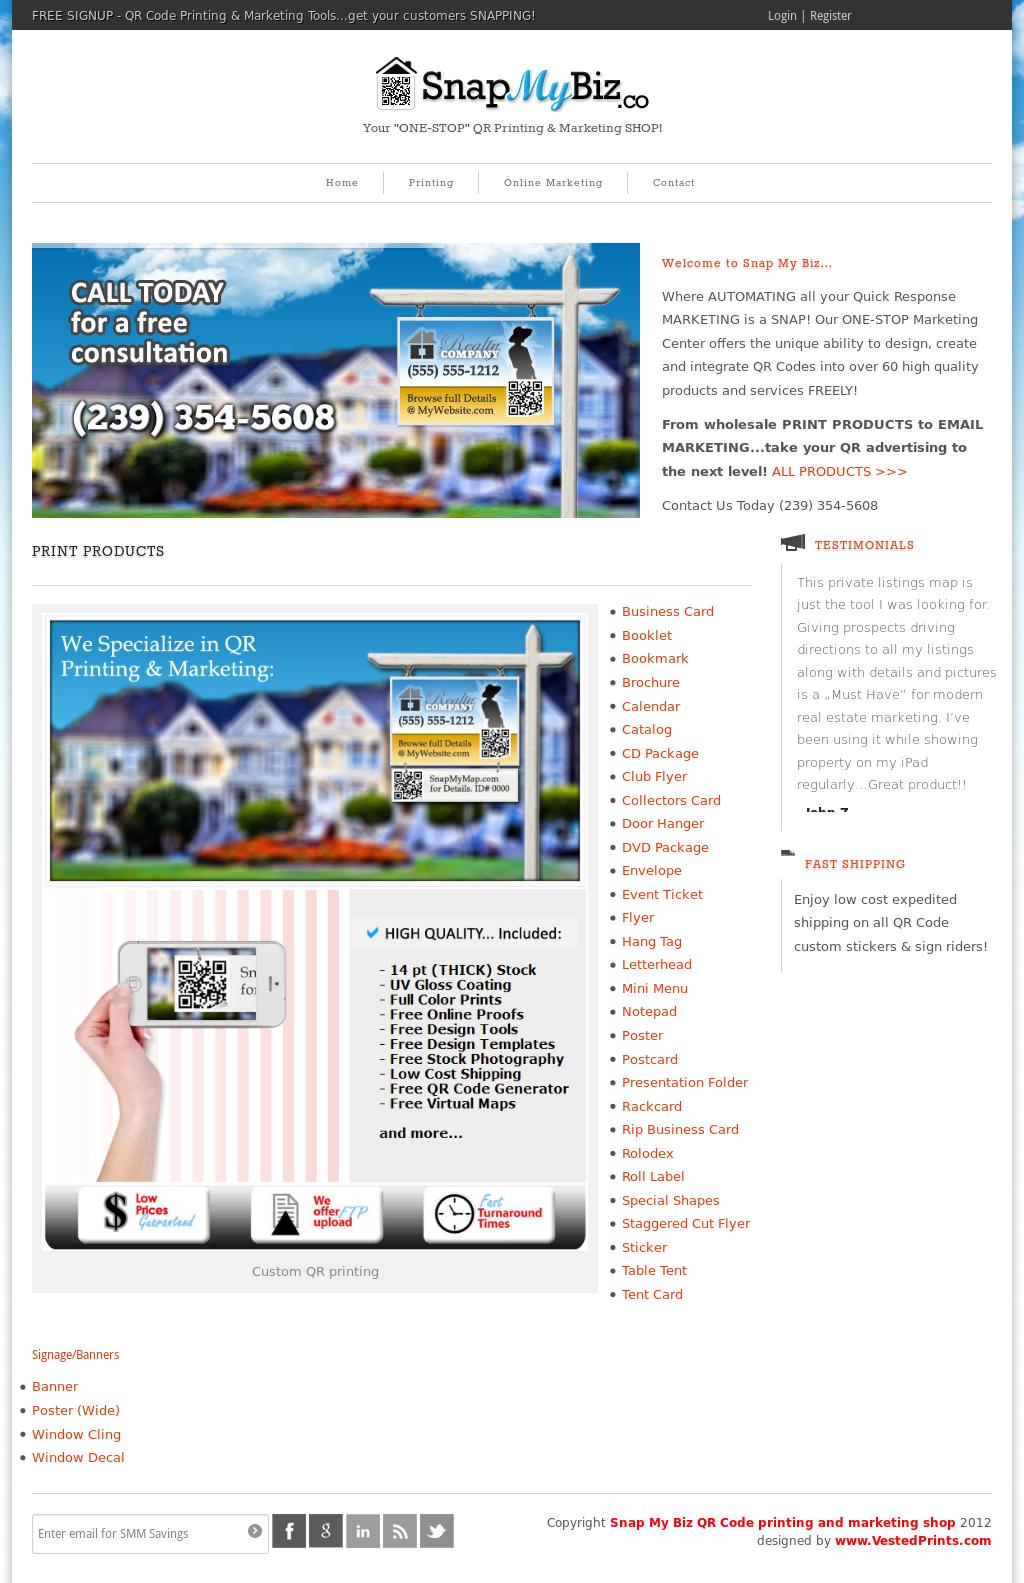 snap my biz qr code printing and marketing shop competitors revenue